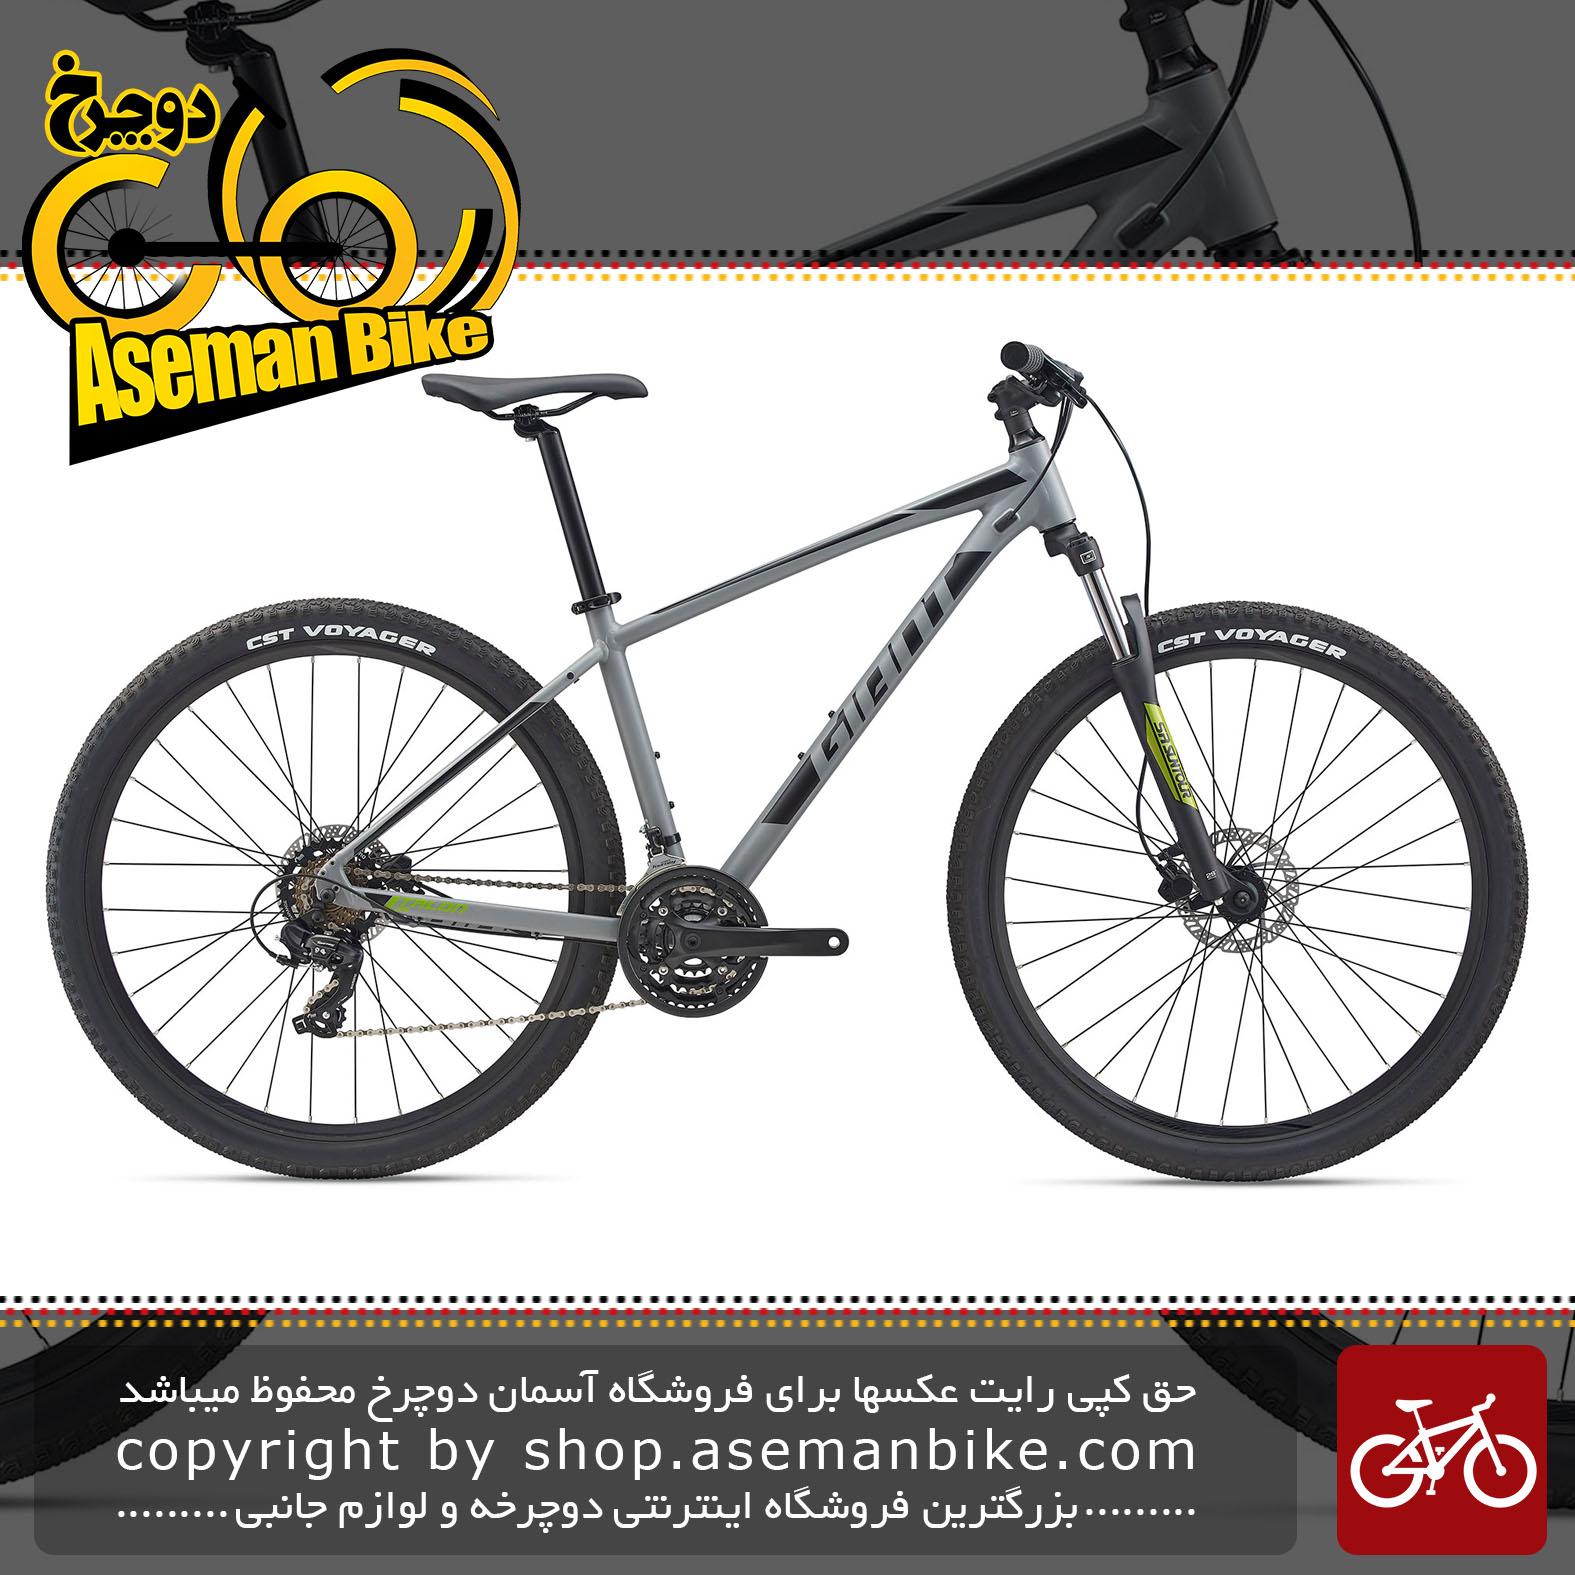 دوچرخه کوهستان جاینت مدل تالون 4 (جی آی) 2020 Giant Mountain Bicycle Talon 29 4 (GI) 2020